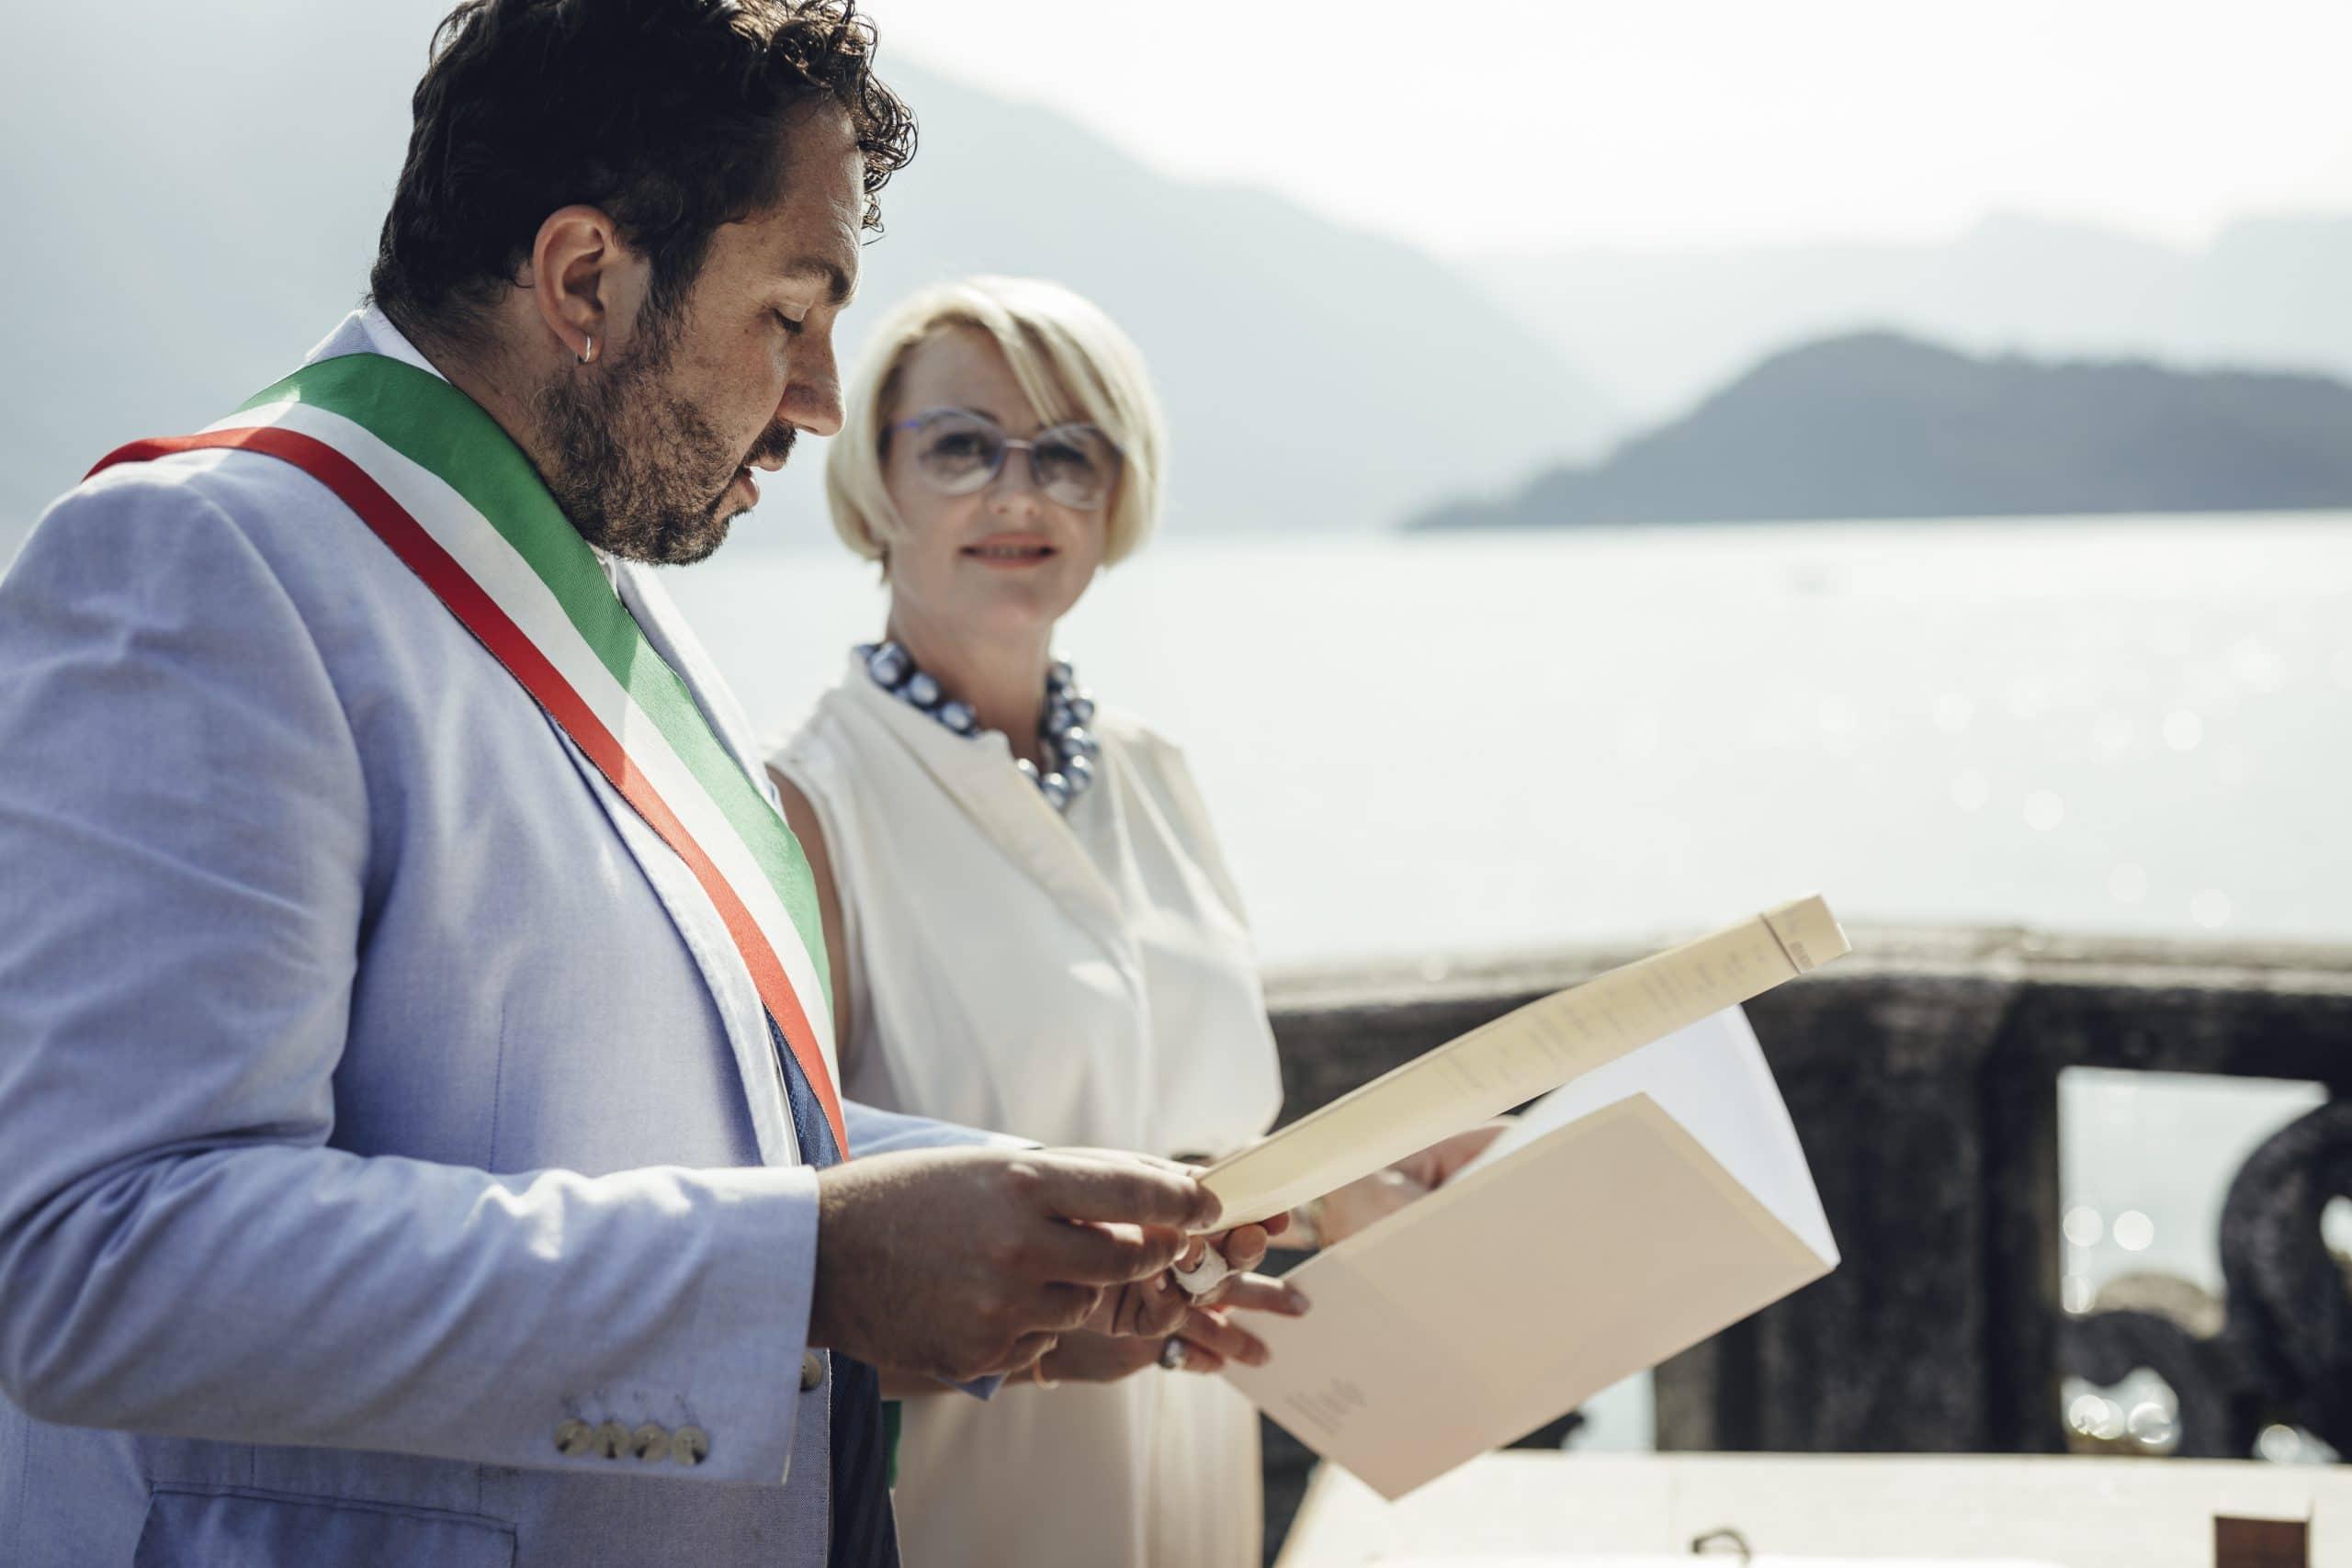 Vilma Wedding & Event Planner _ Vilma Rapšaitė _ vestuves italijoj _ santuoka uzsieny _ vestuvių organizatorė _ santuokos koordinatorė